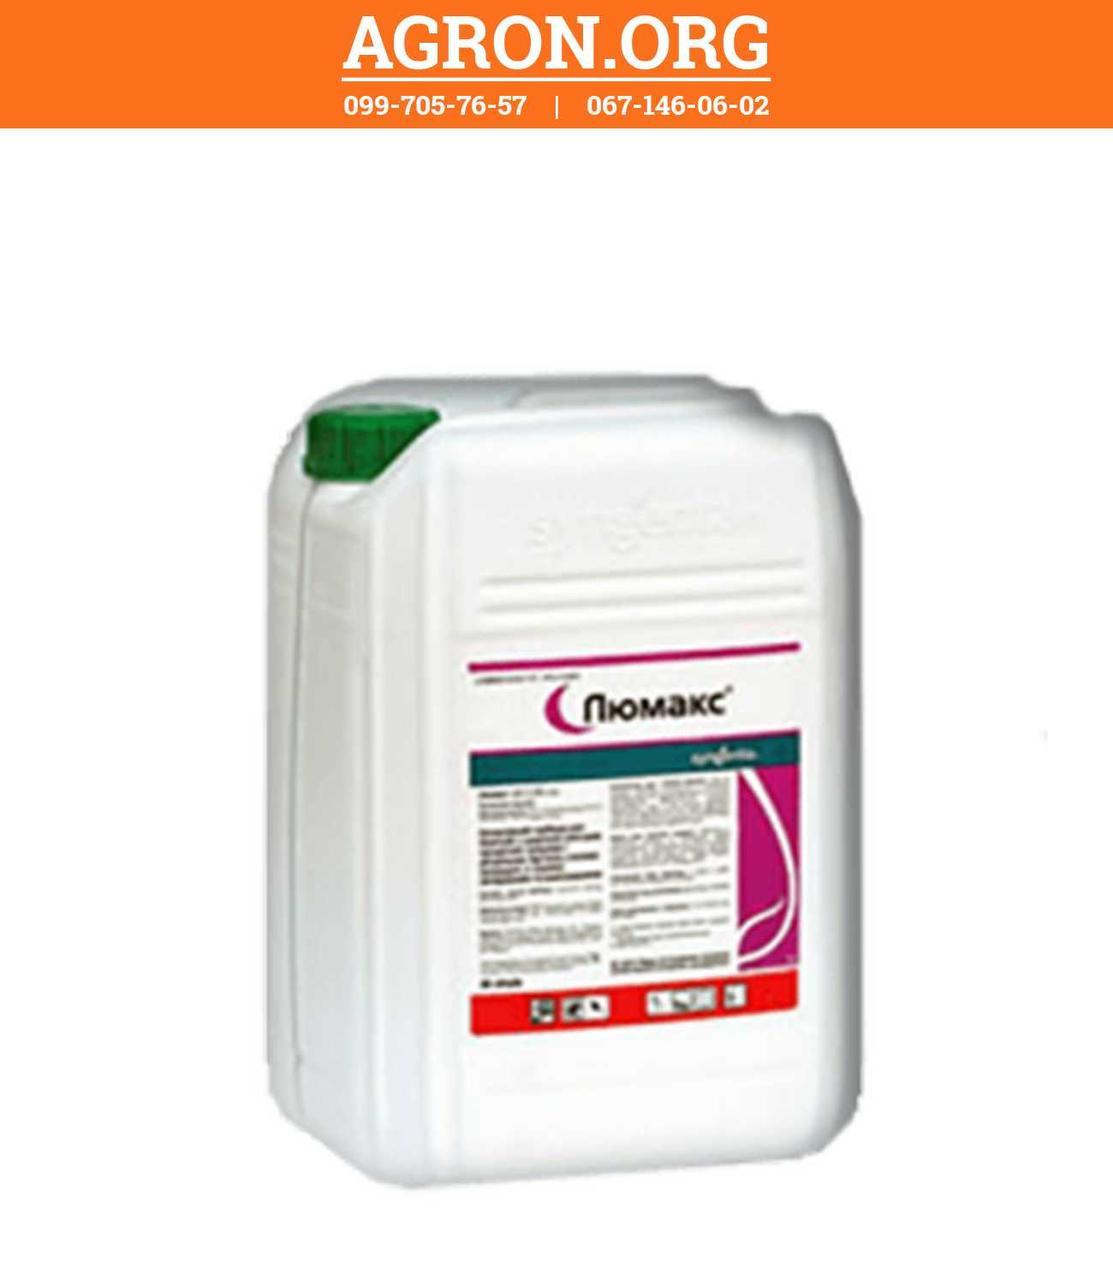 Люмакс гербицид по посівах кукурудзи Syngenta 20 л